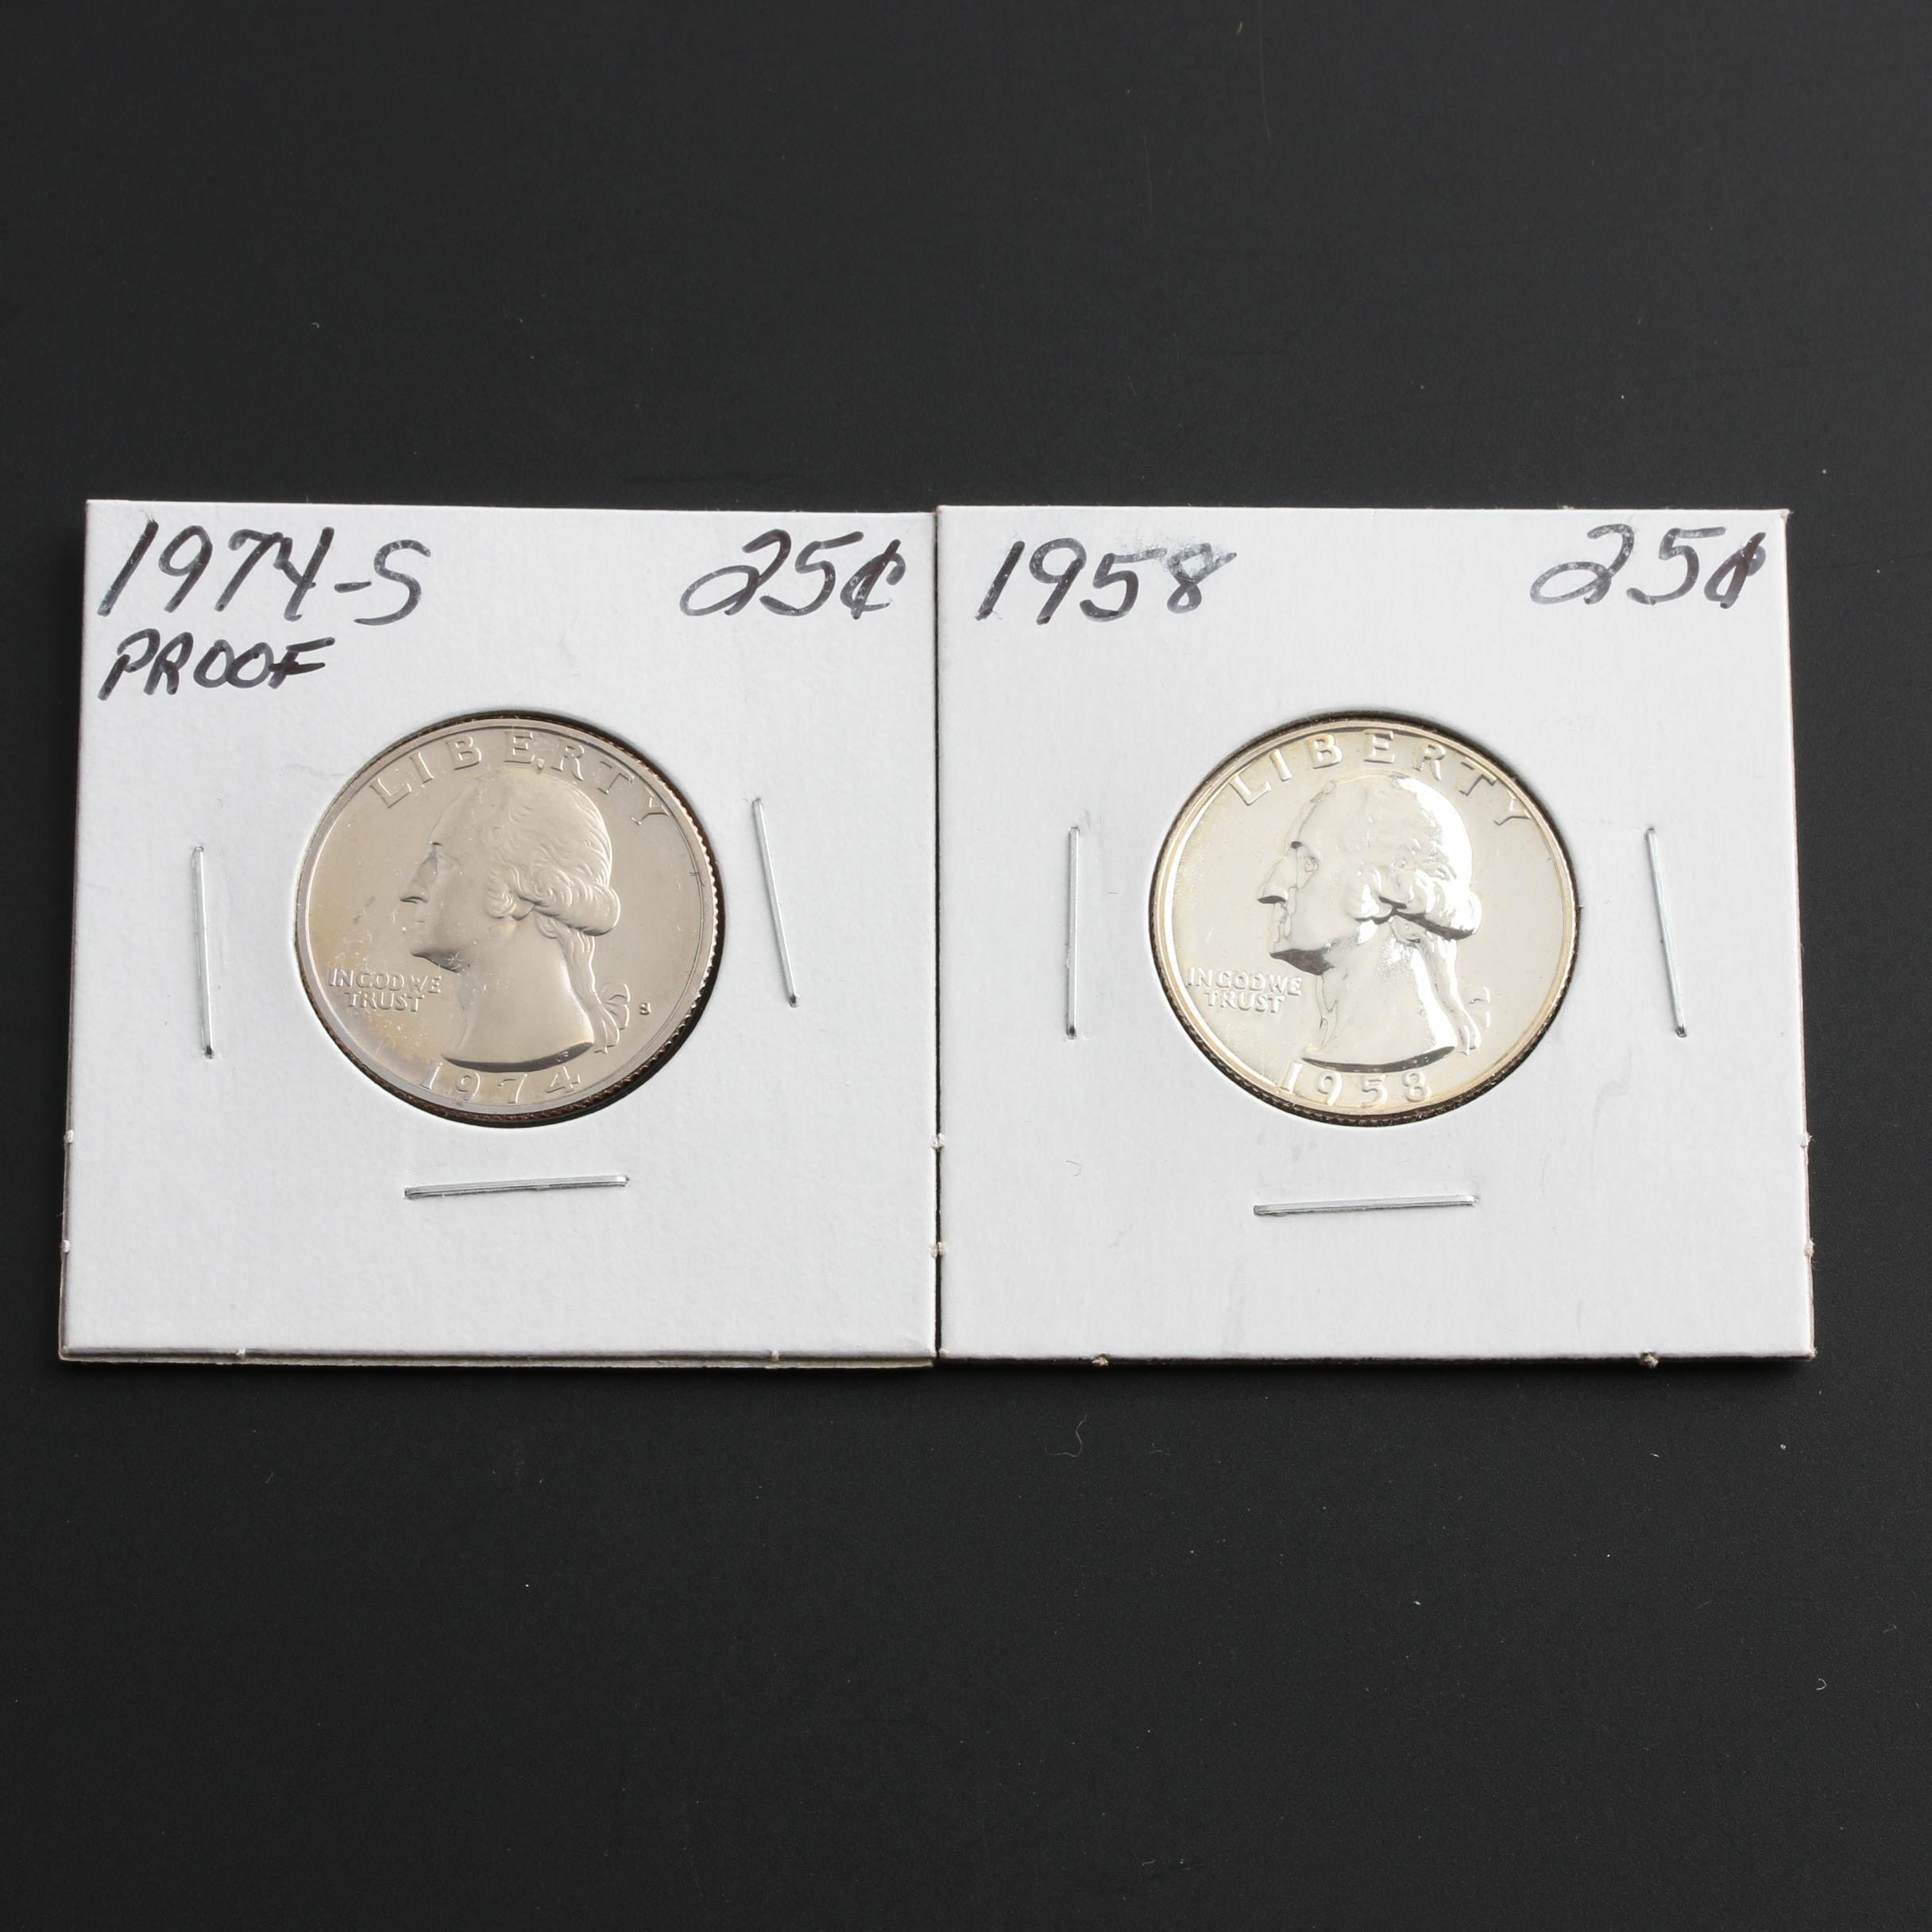 Two Proof Washington Quarters, One Silver